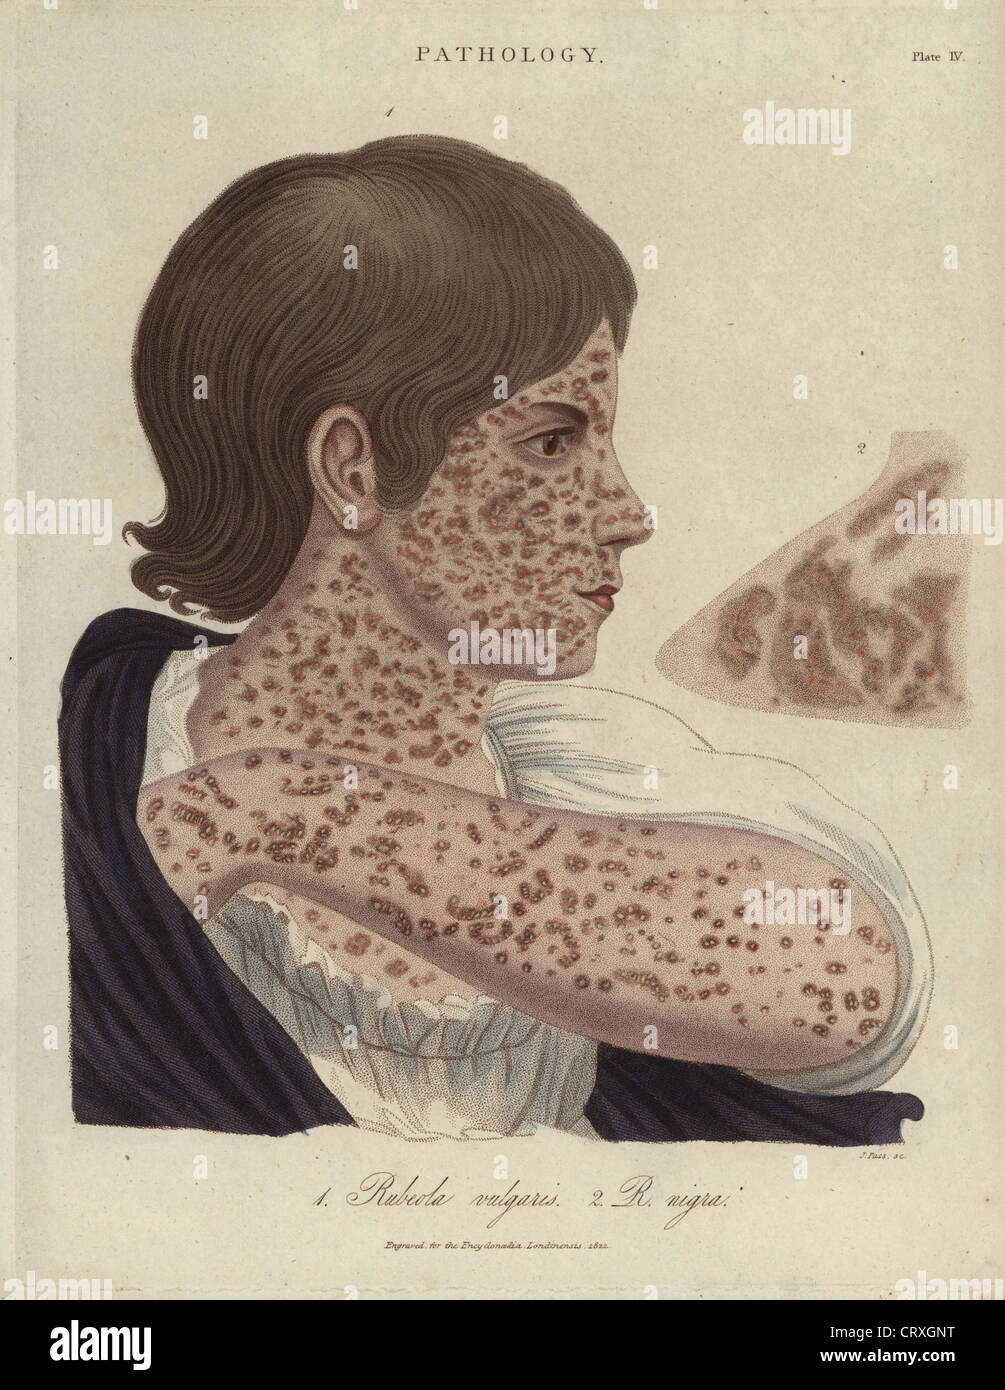 Measles, Rubeola vulgaris and R. nigra, from 'Encyclopedia Londinensis,' 1822. - Stock Image